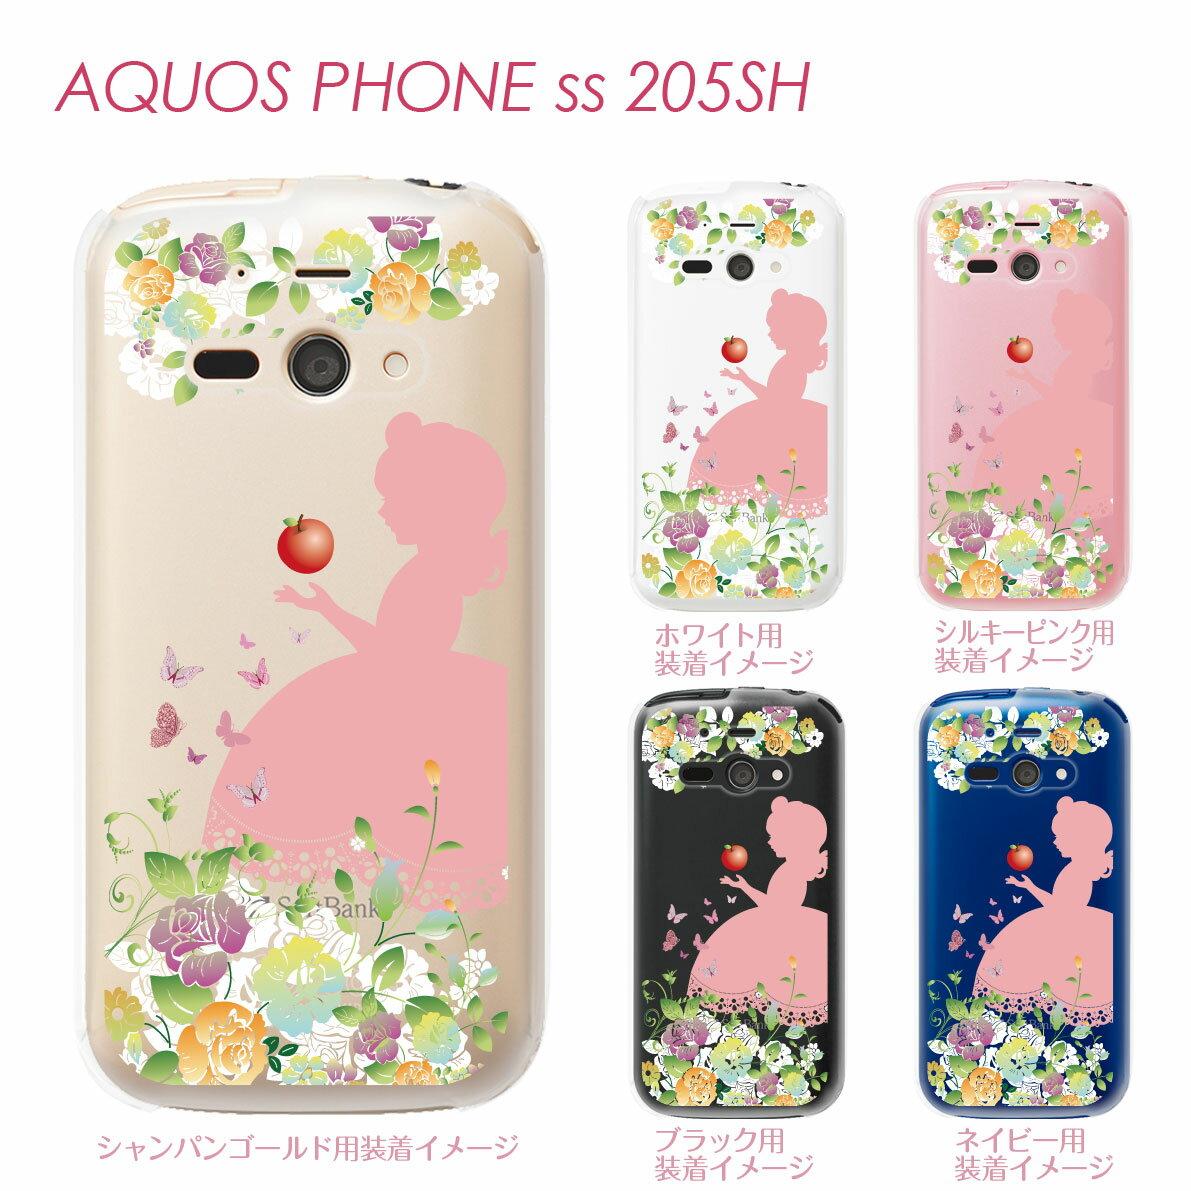 【AQUOS PHONE ss 205SH】【205sh】【Soft Bank】【カバー】【ケース】【スマホケース】【クリアケース】【クリアーアーツ】【白雪姫】 08-205sh-ca0100d